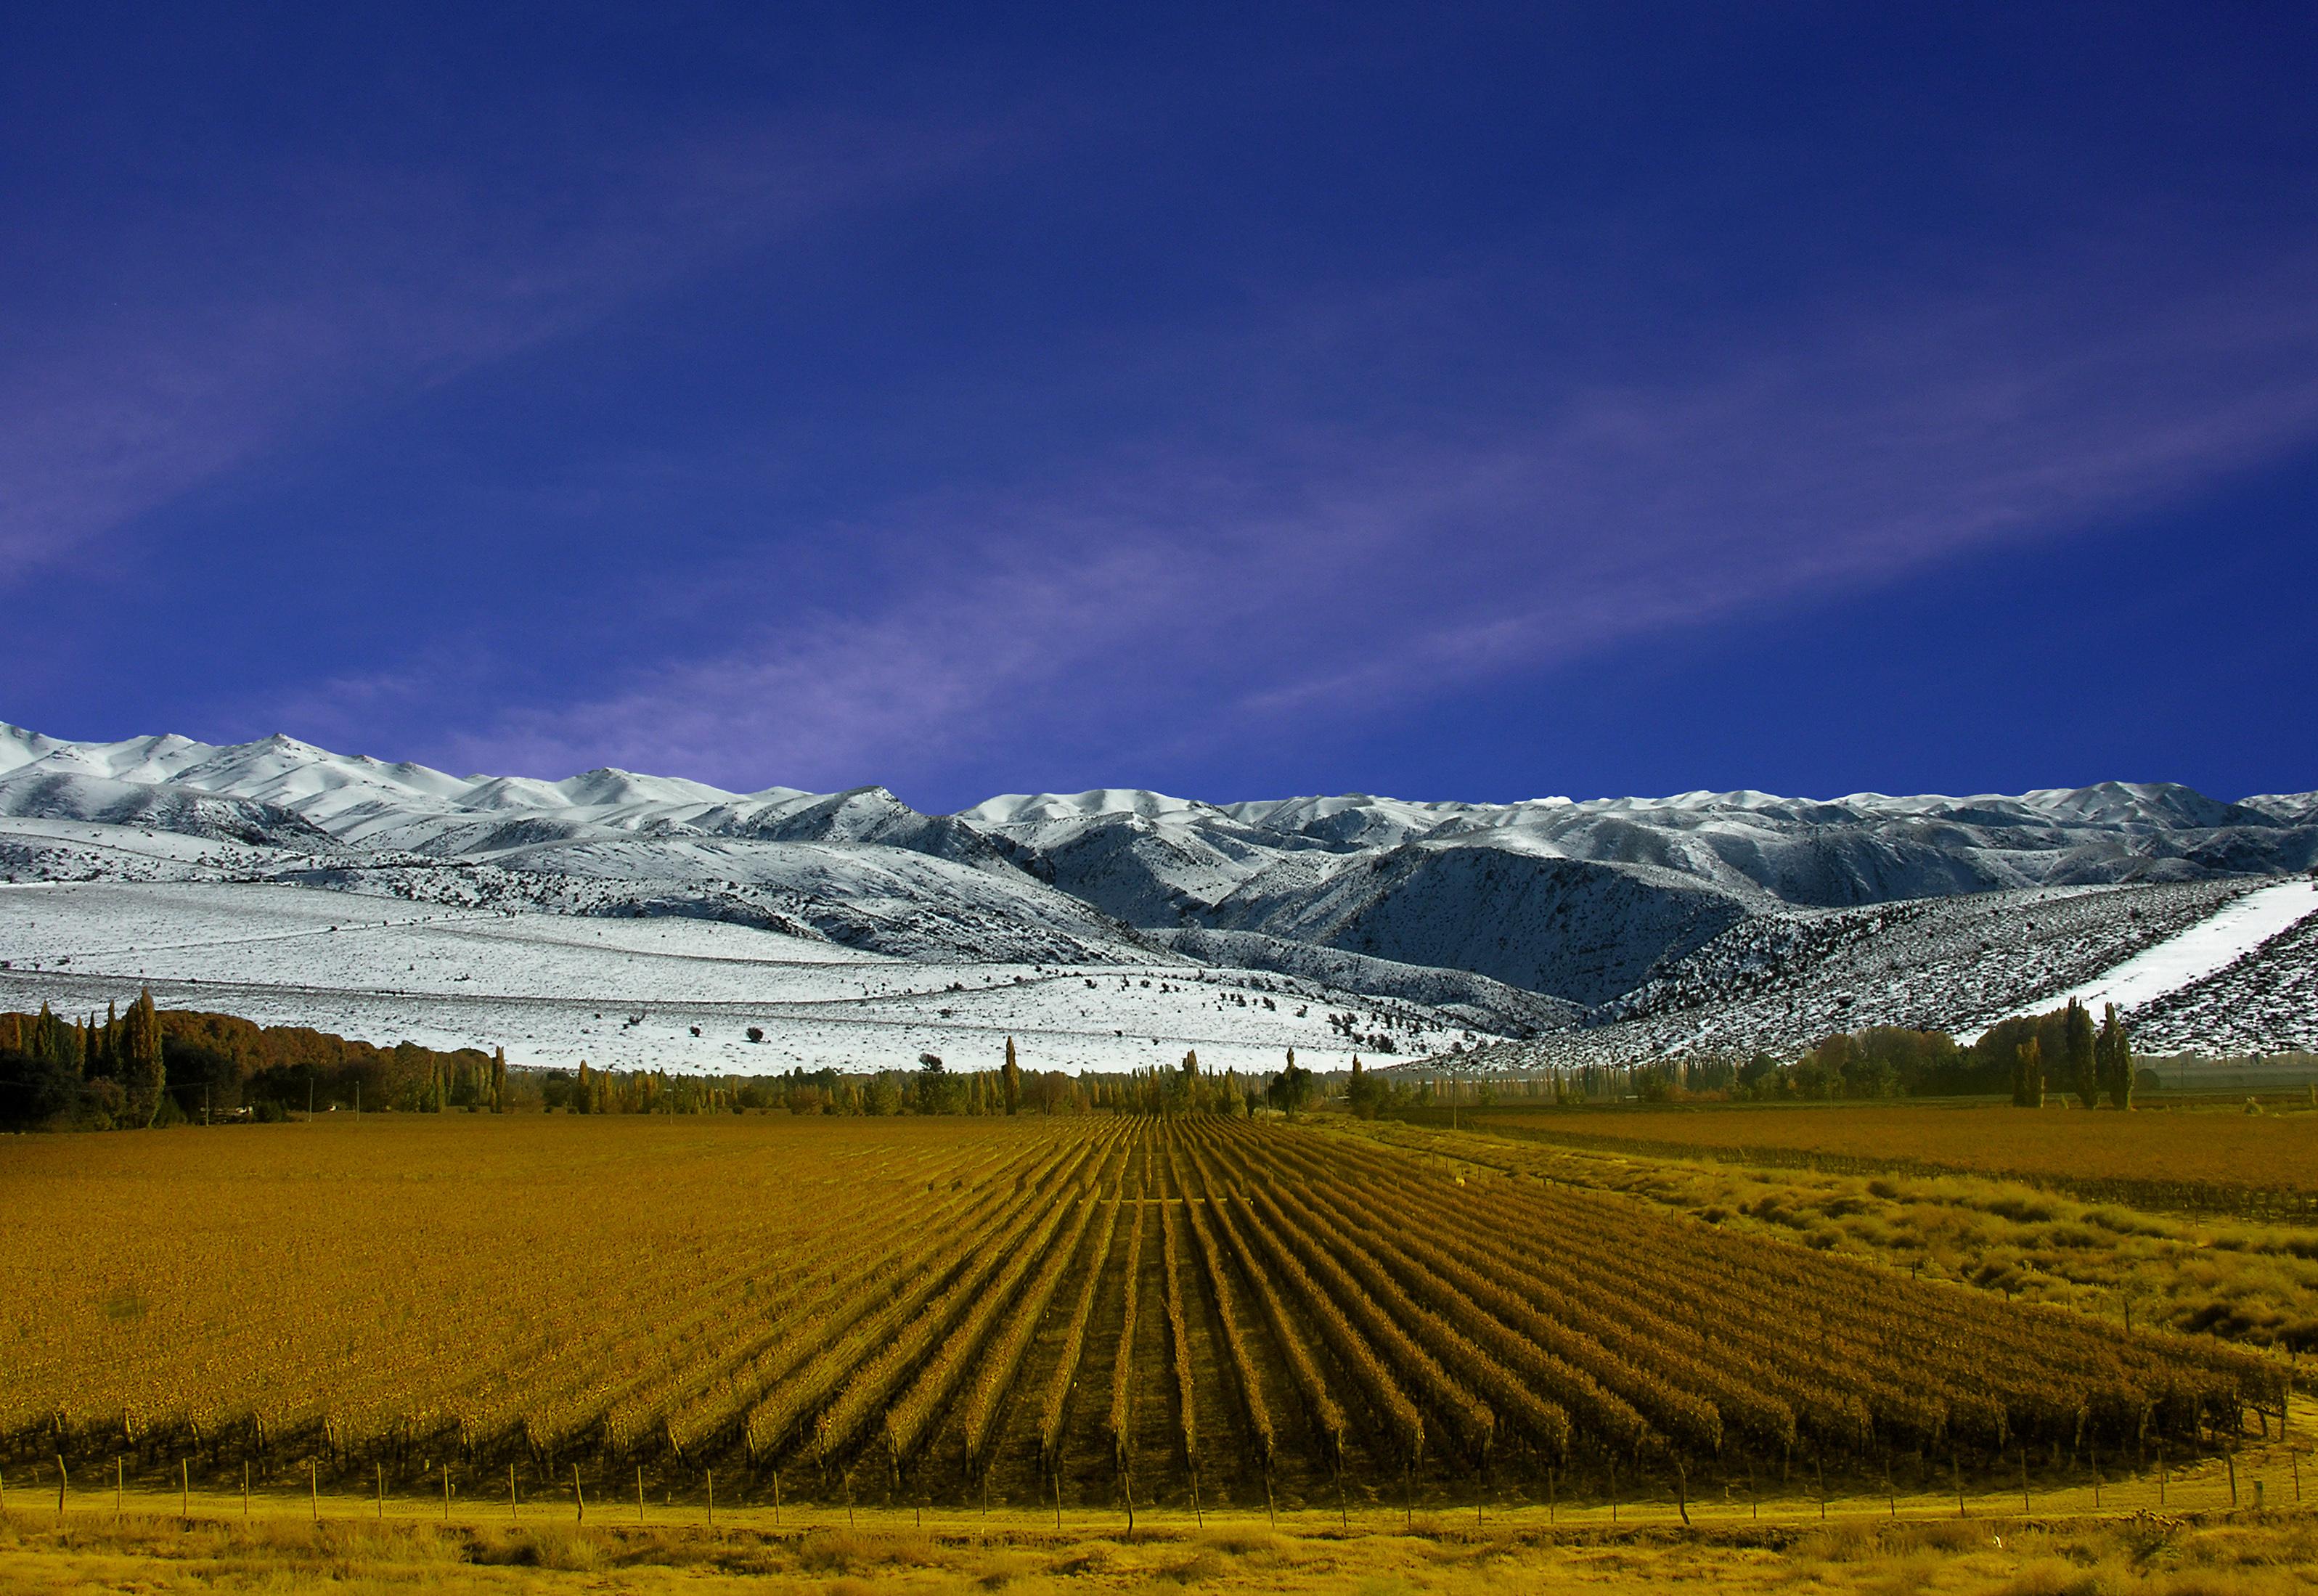 File:Viñedos de Mendoza.jpg - Wikimedia Commons